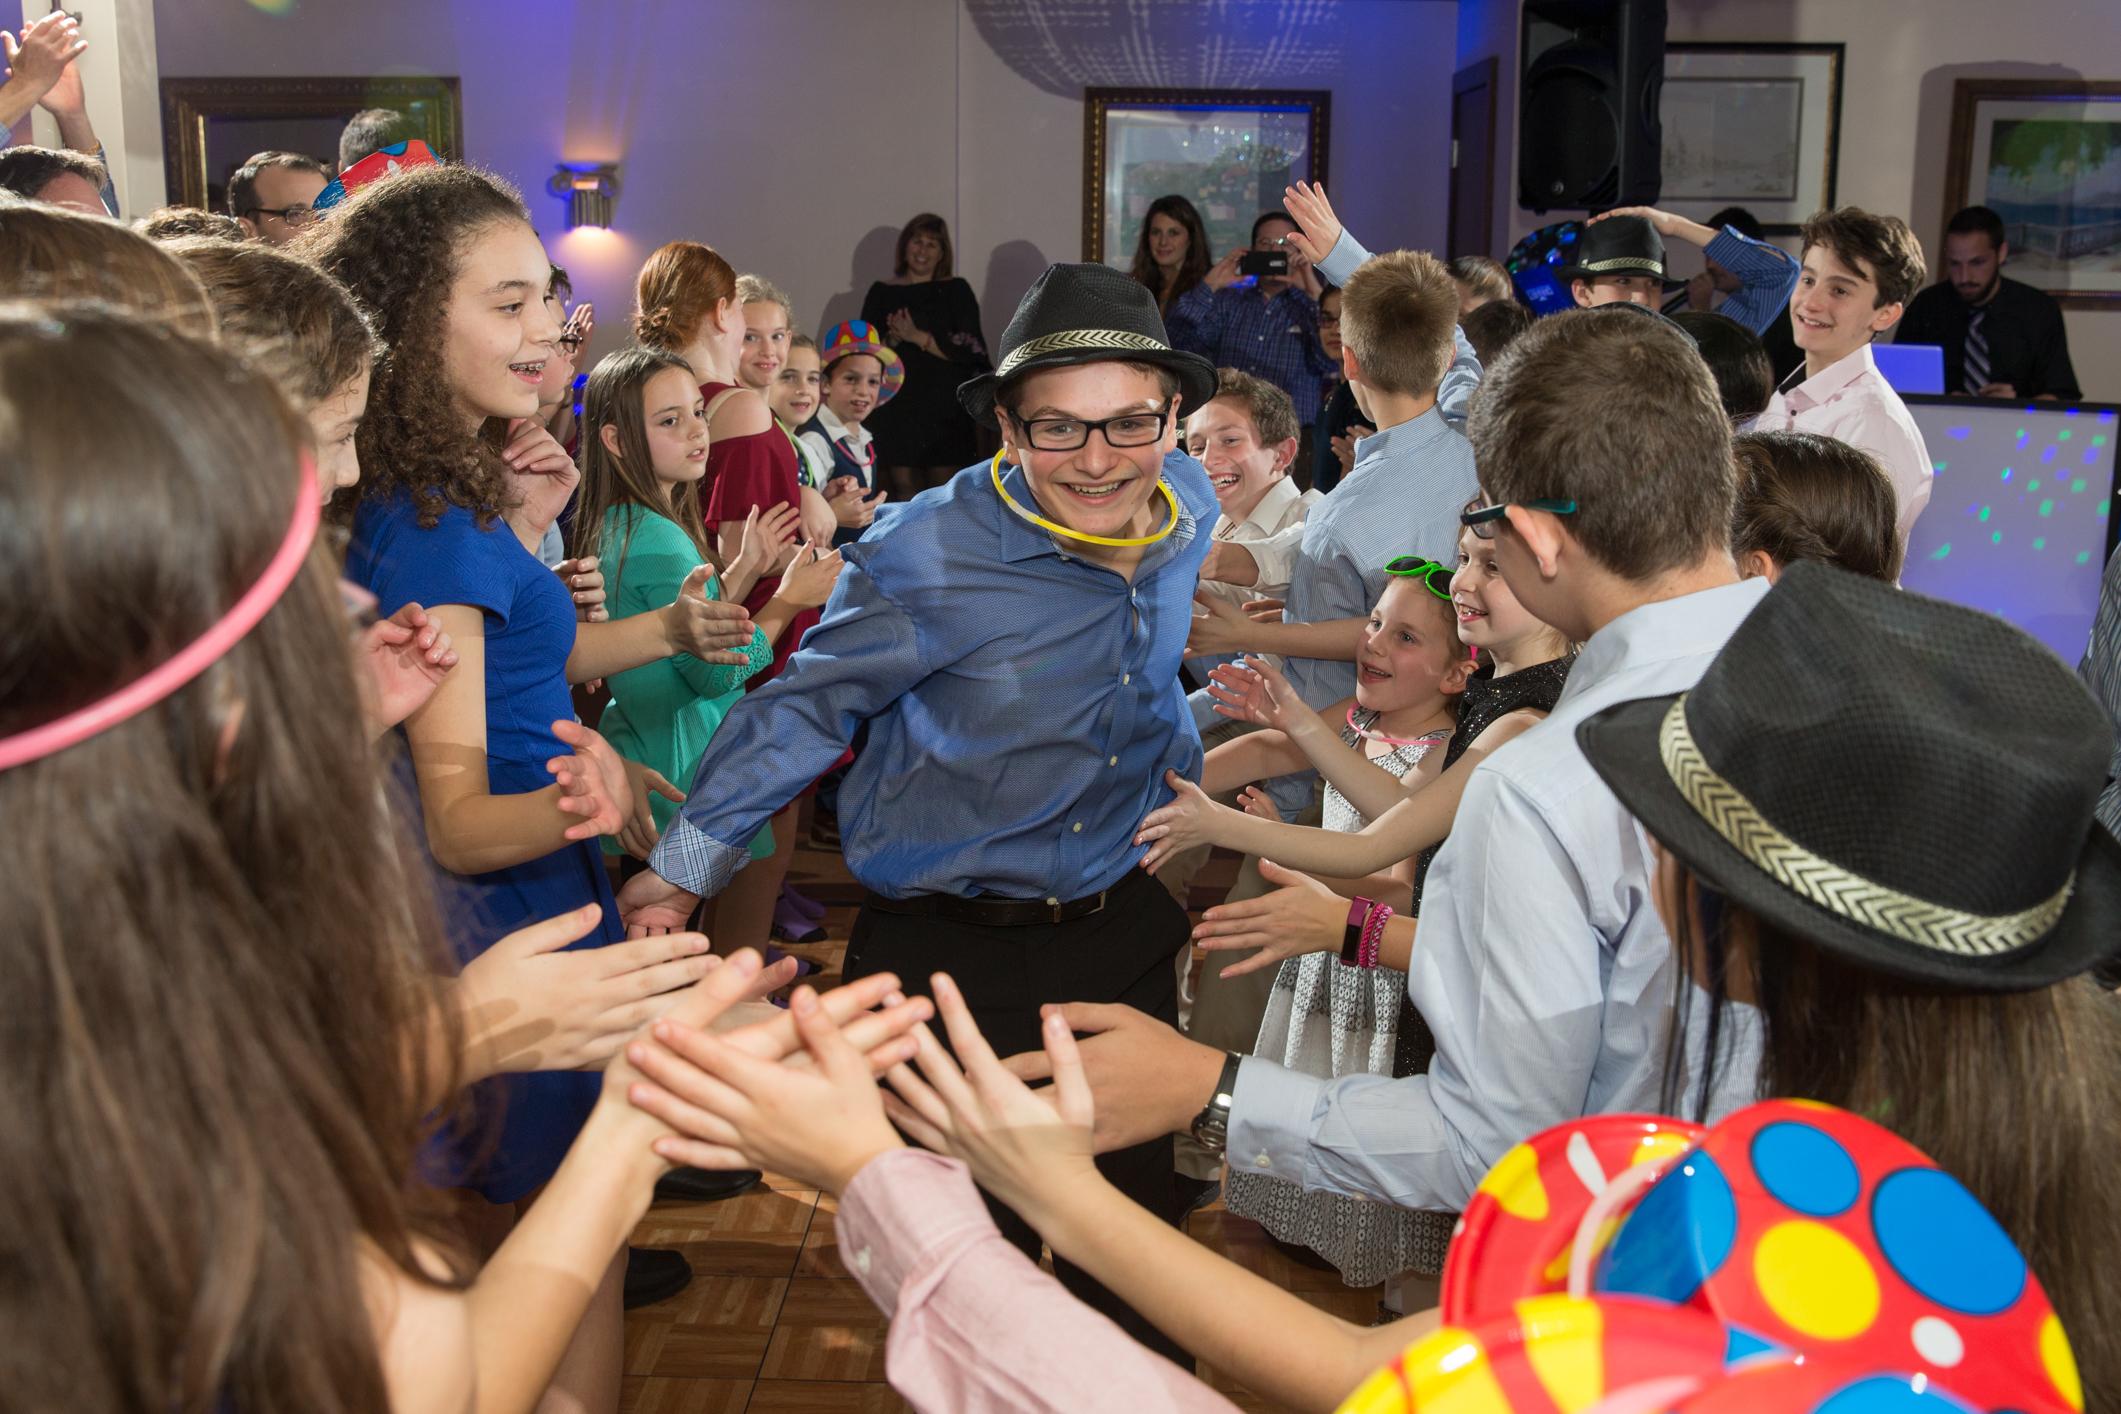 Gaithersburg Maryland Bar Mitzvah Photographer - Blog